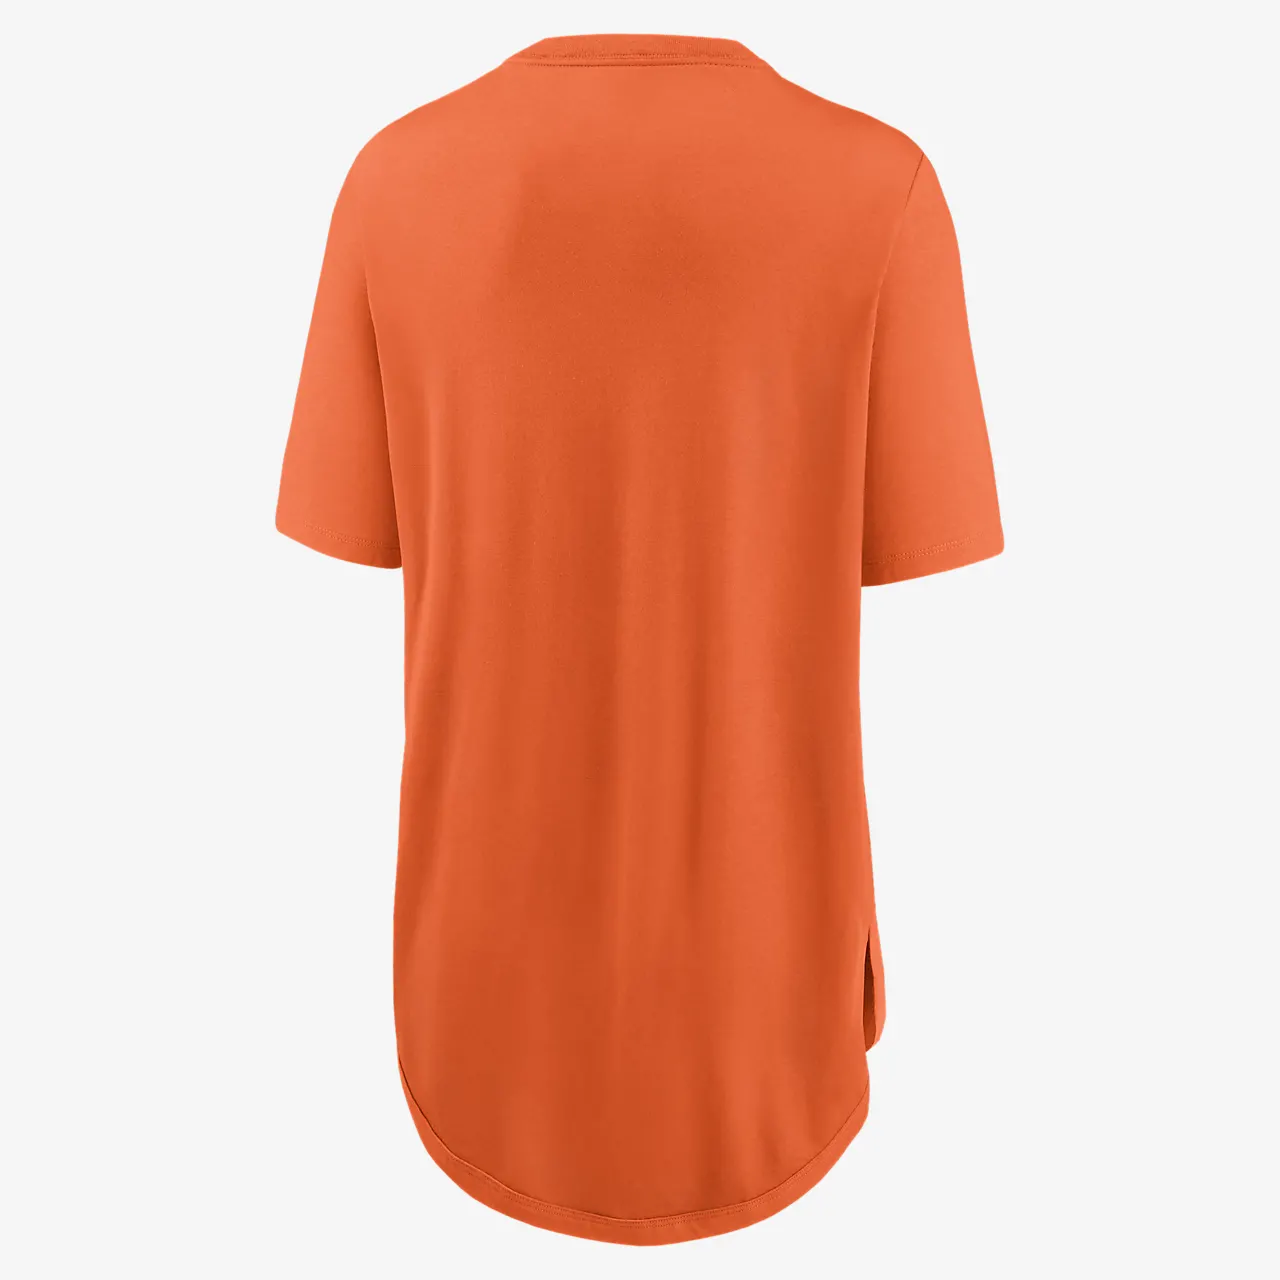 Nike Historic (NFL Browns) Women's T-Shirt FA20NKDP89N-BR2